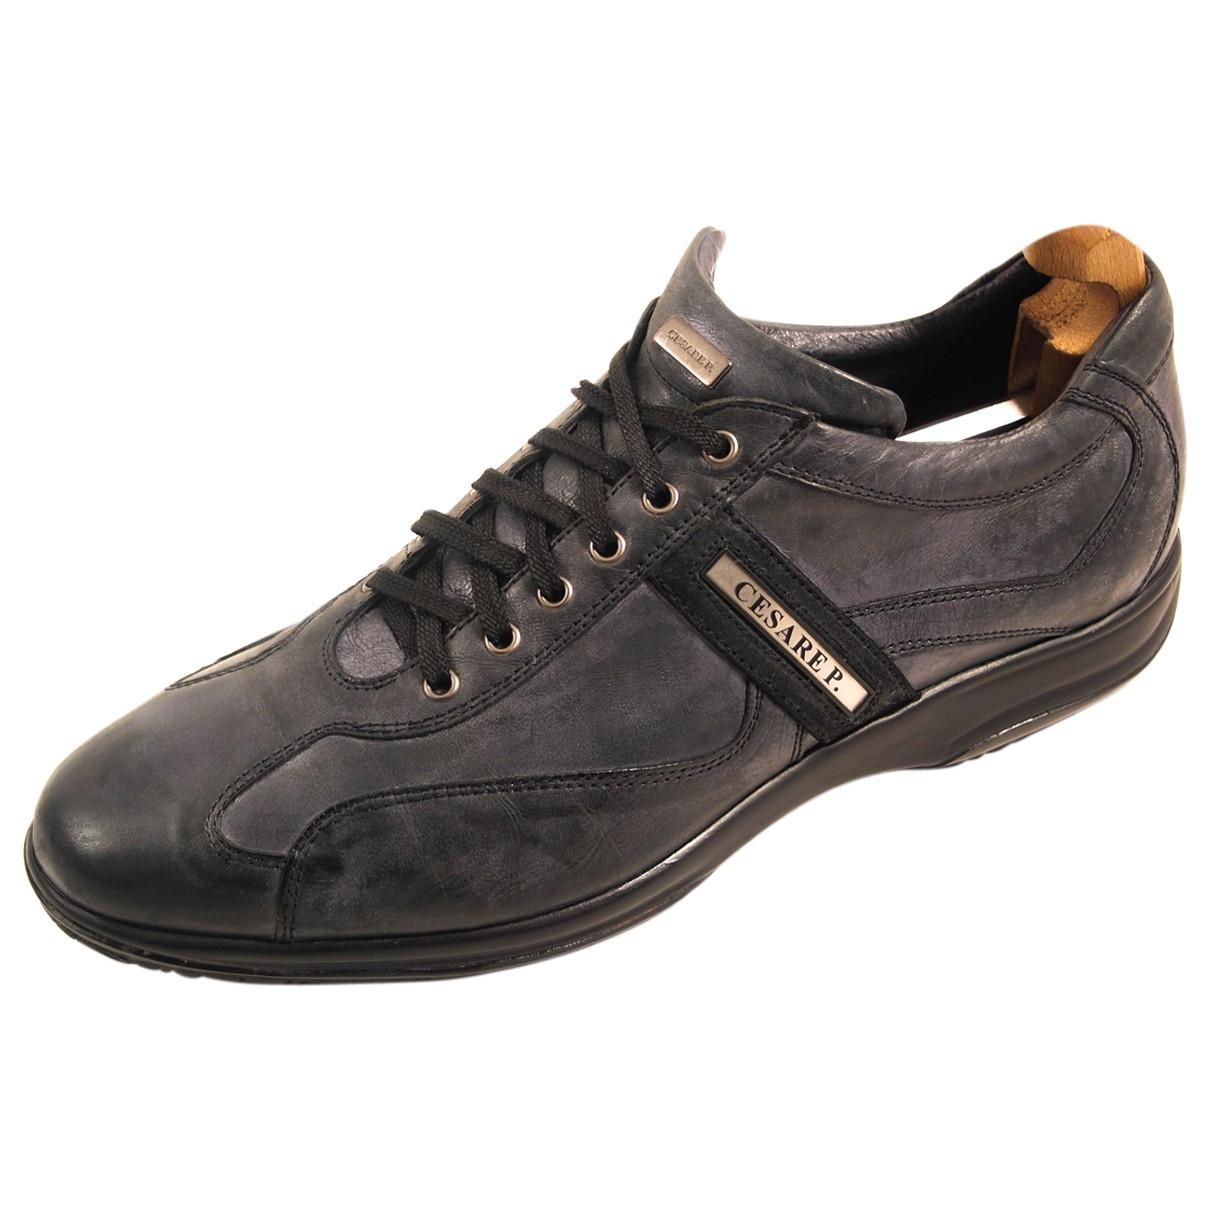 Cesare Paciotti \N Grey Leather Trainers for Men 44 EU